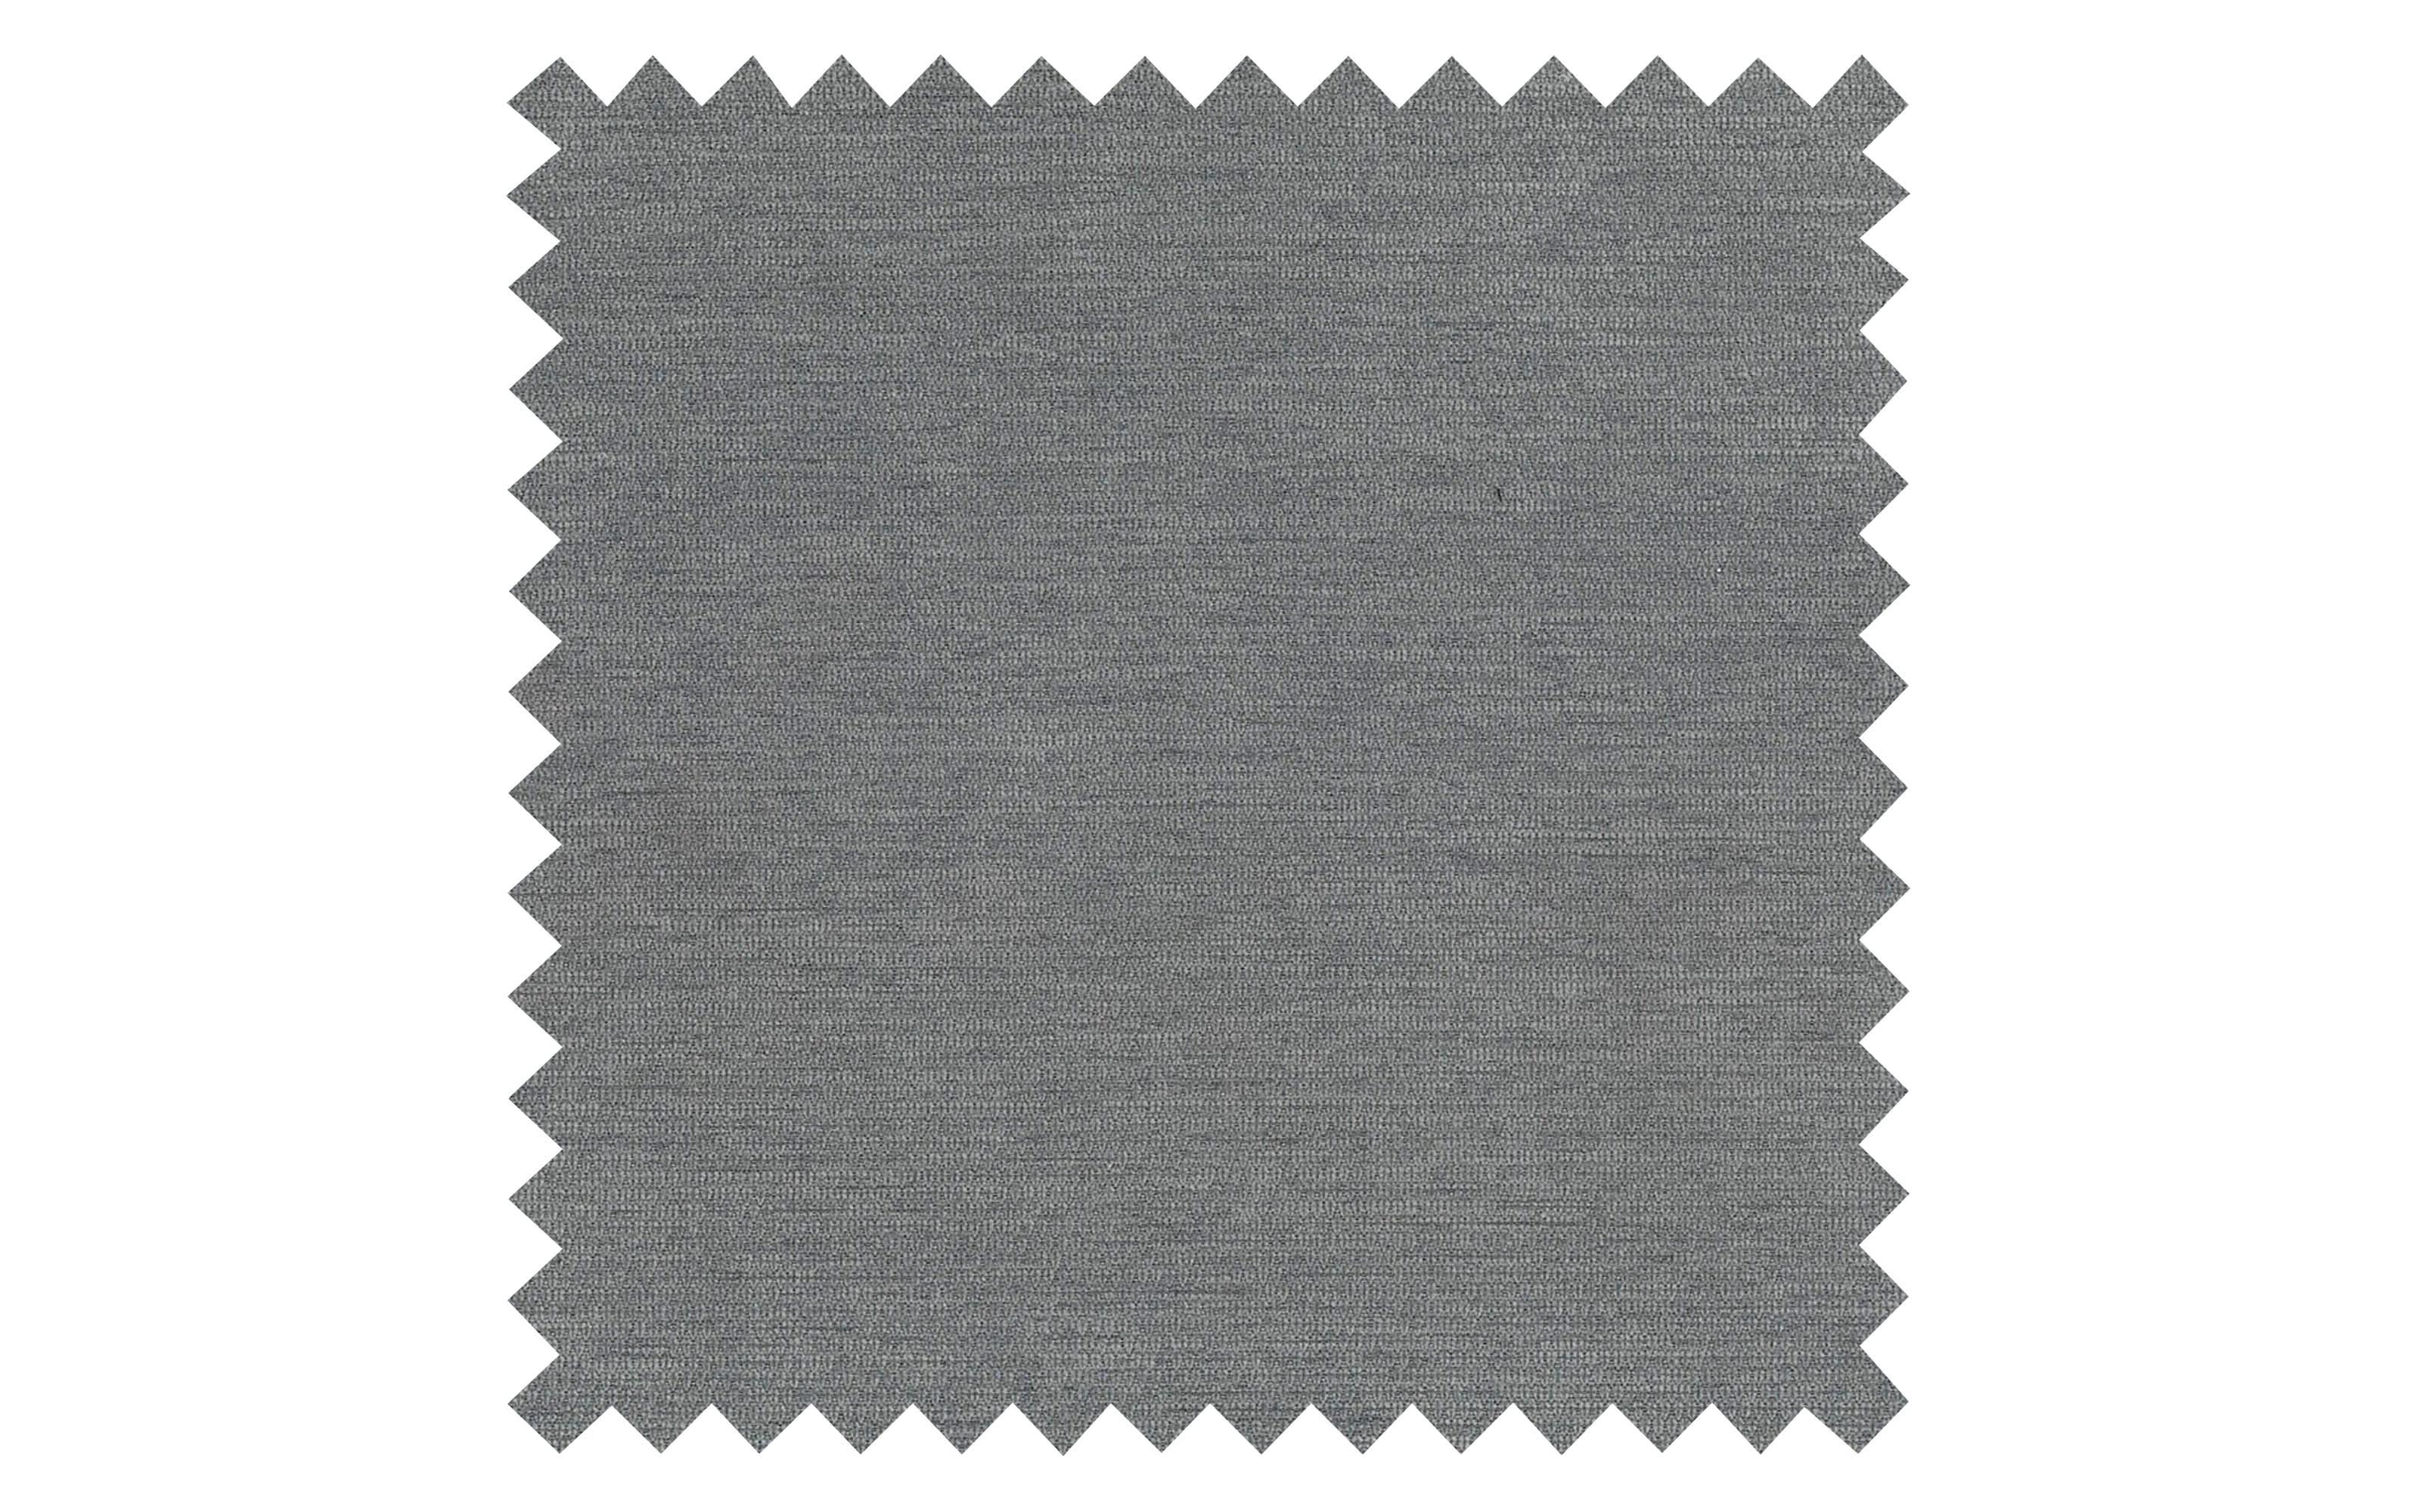 Boxspringbett Lea in grau, mit 2 Rückenkissen, Liegefläche ca. 180 x 200 cm